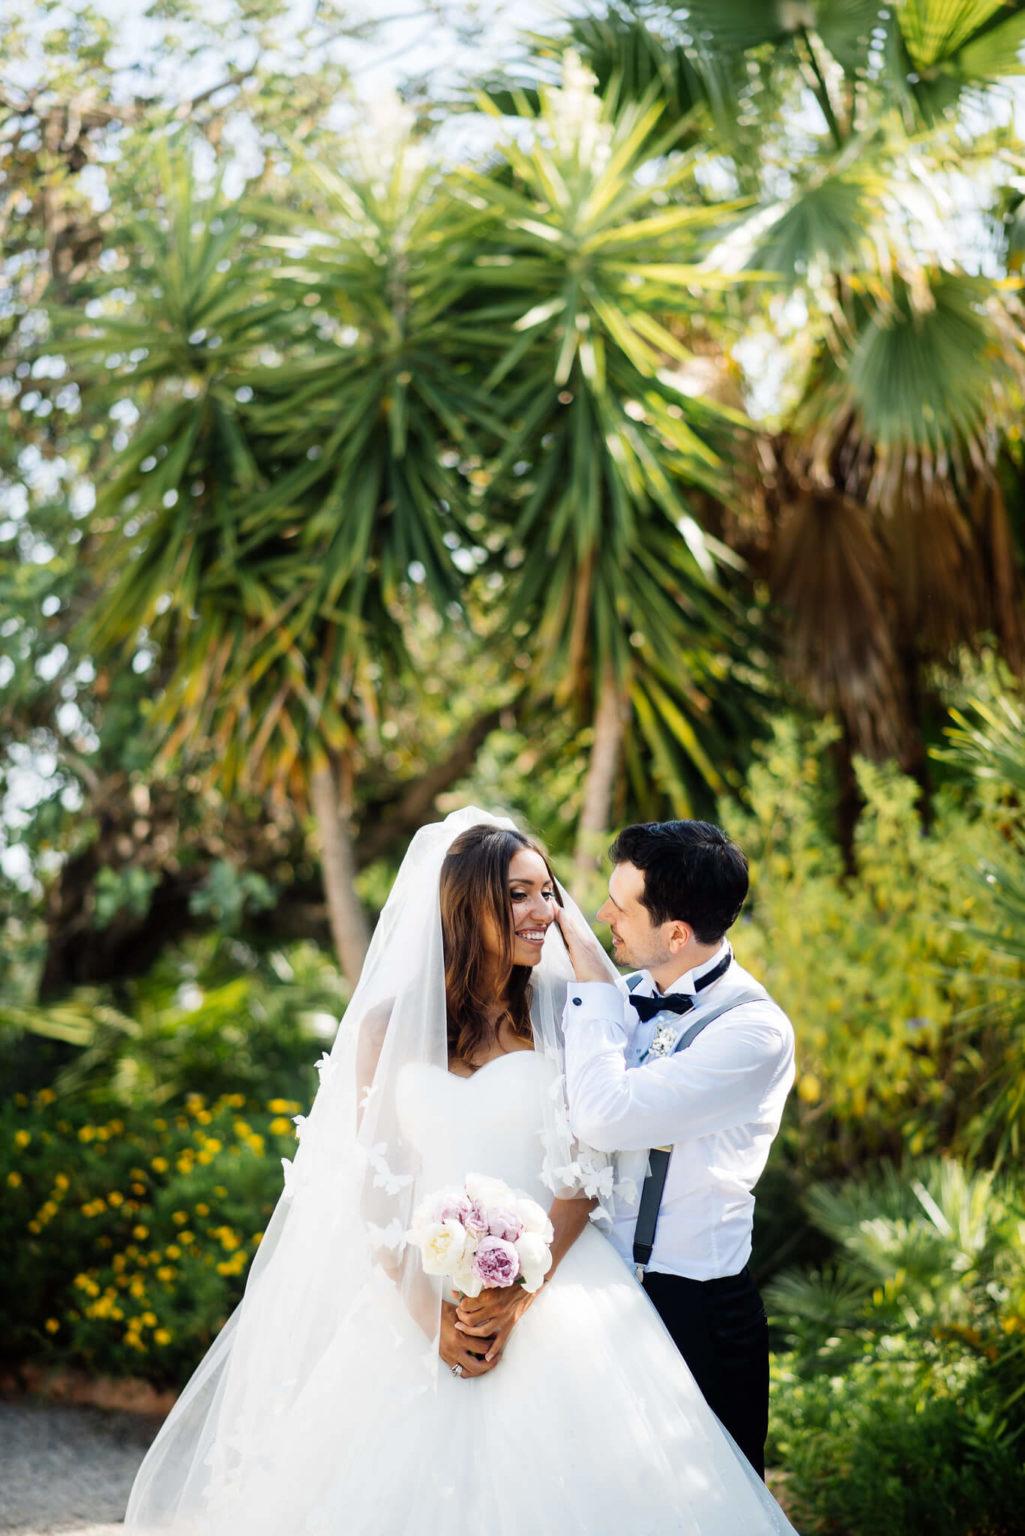 https://www.white-ibiza.com/wp-content/uploads/2020/03/white-ibiza-weddings-dario-sanz-photography-2020-10-1-1025x1536.jpg